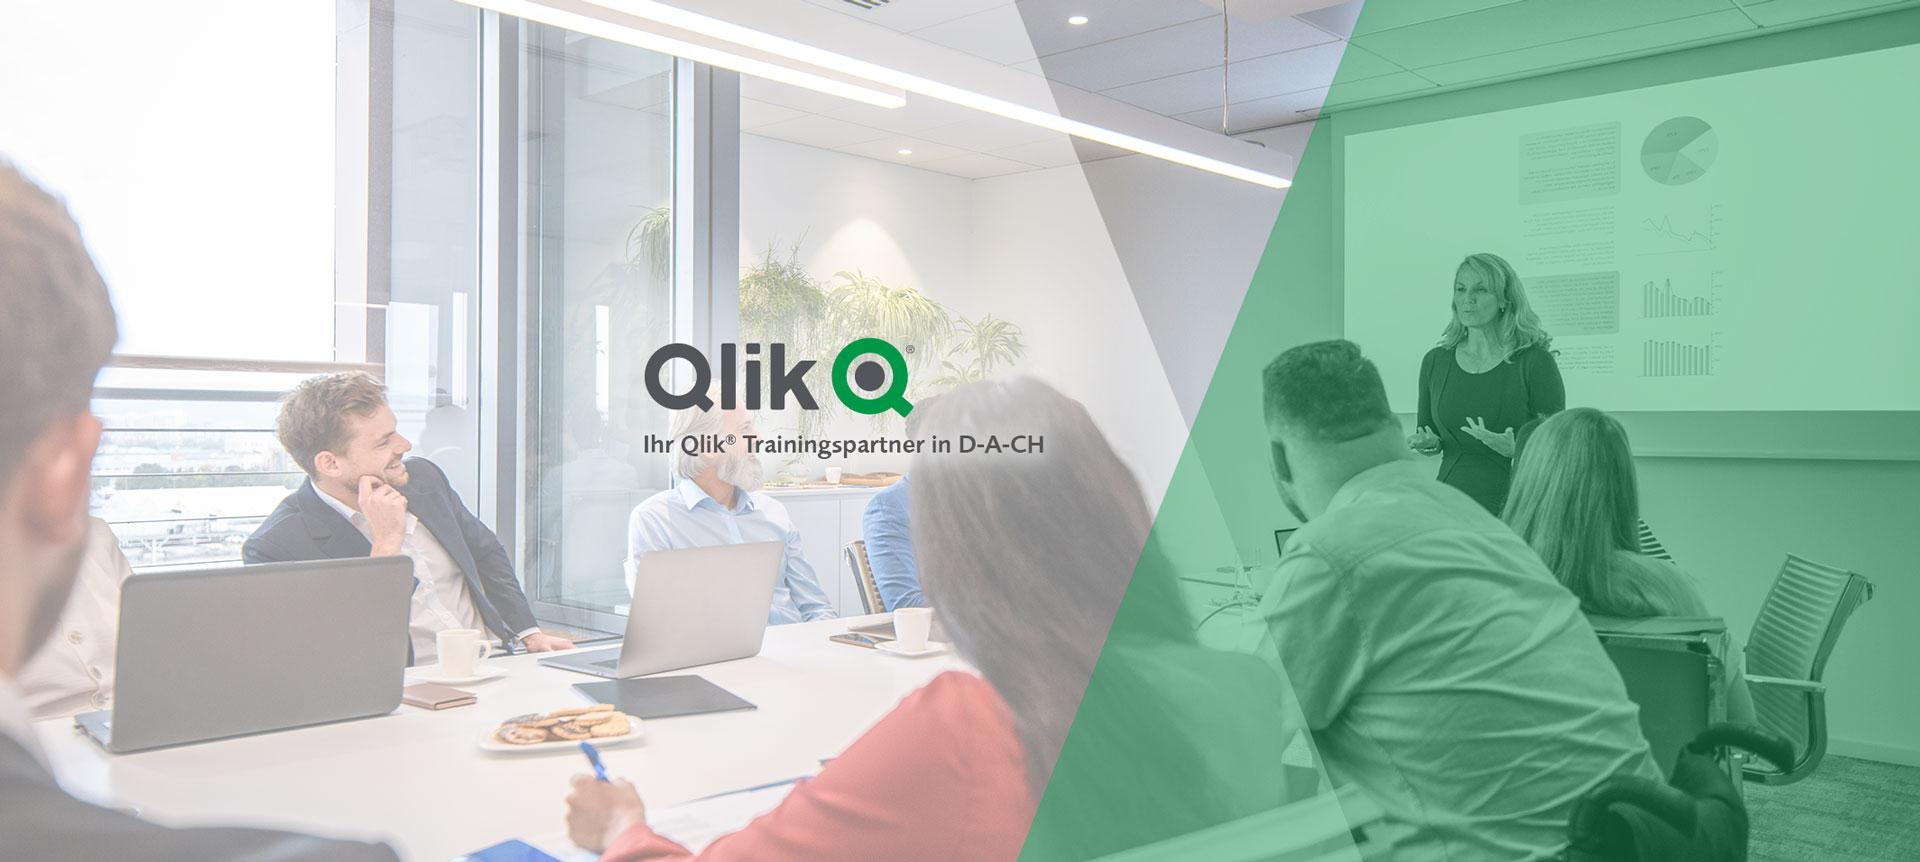 Qlik Sense und QlikView Trainings von EVACO